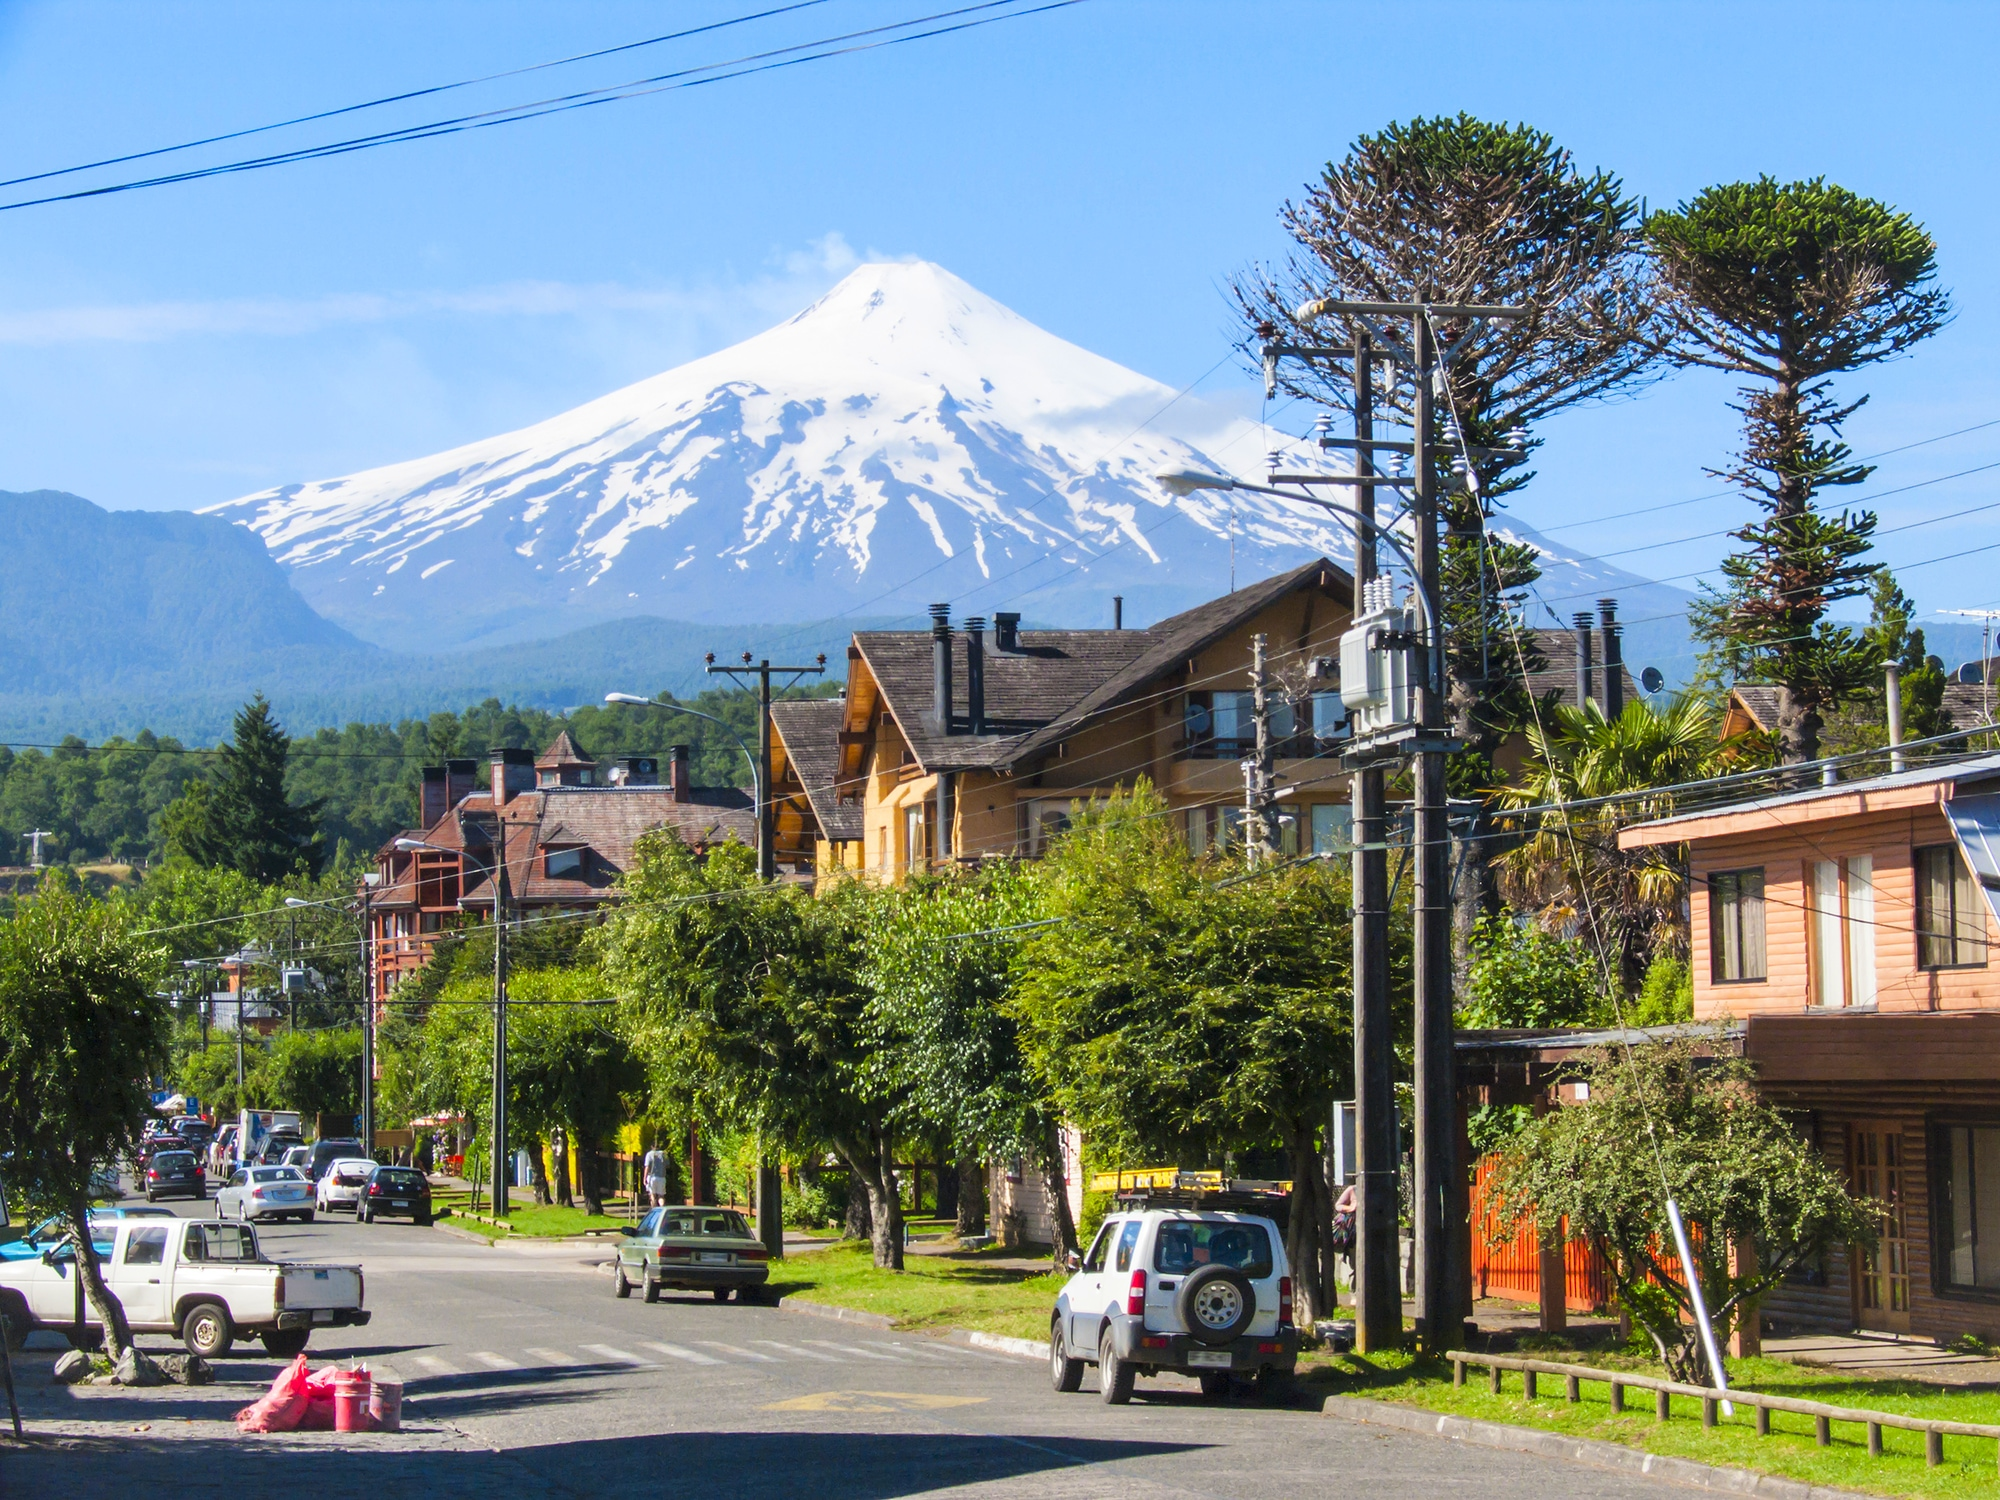 Le Chili, Grandeur nature